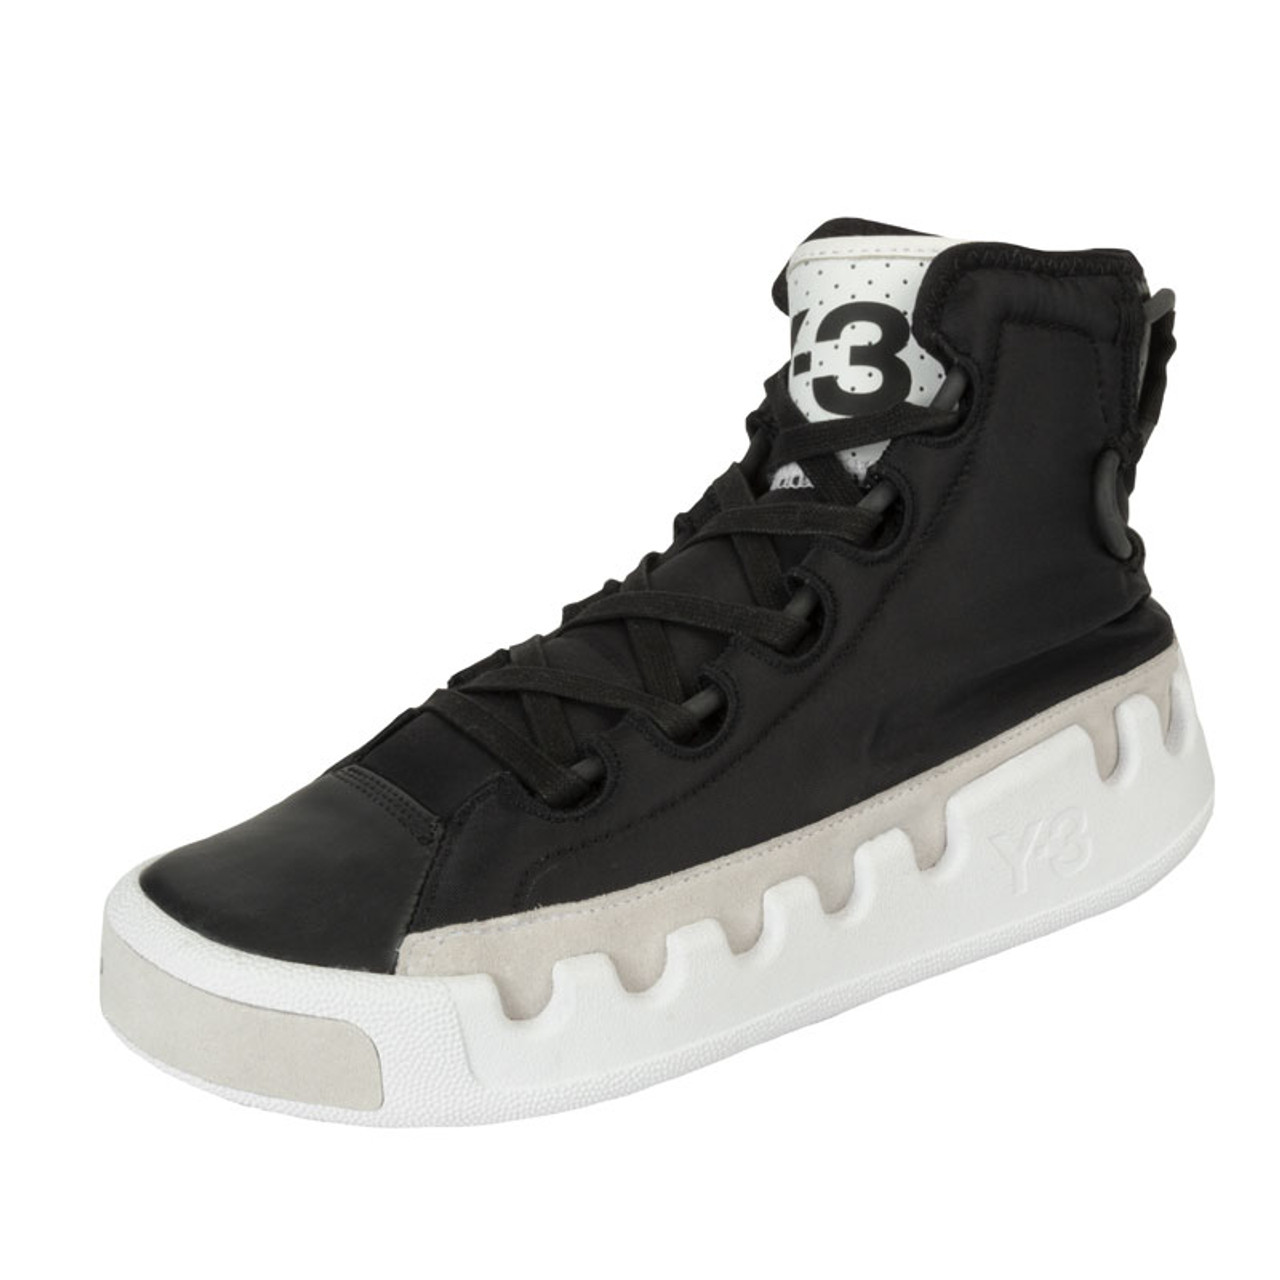 high top sneakers sale